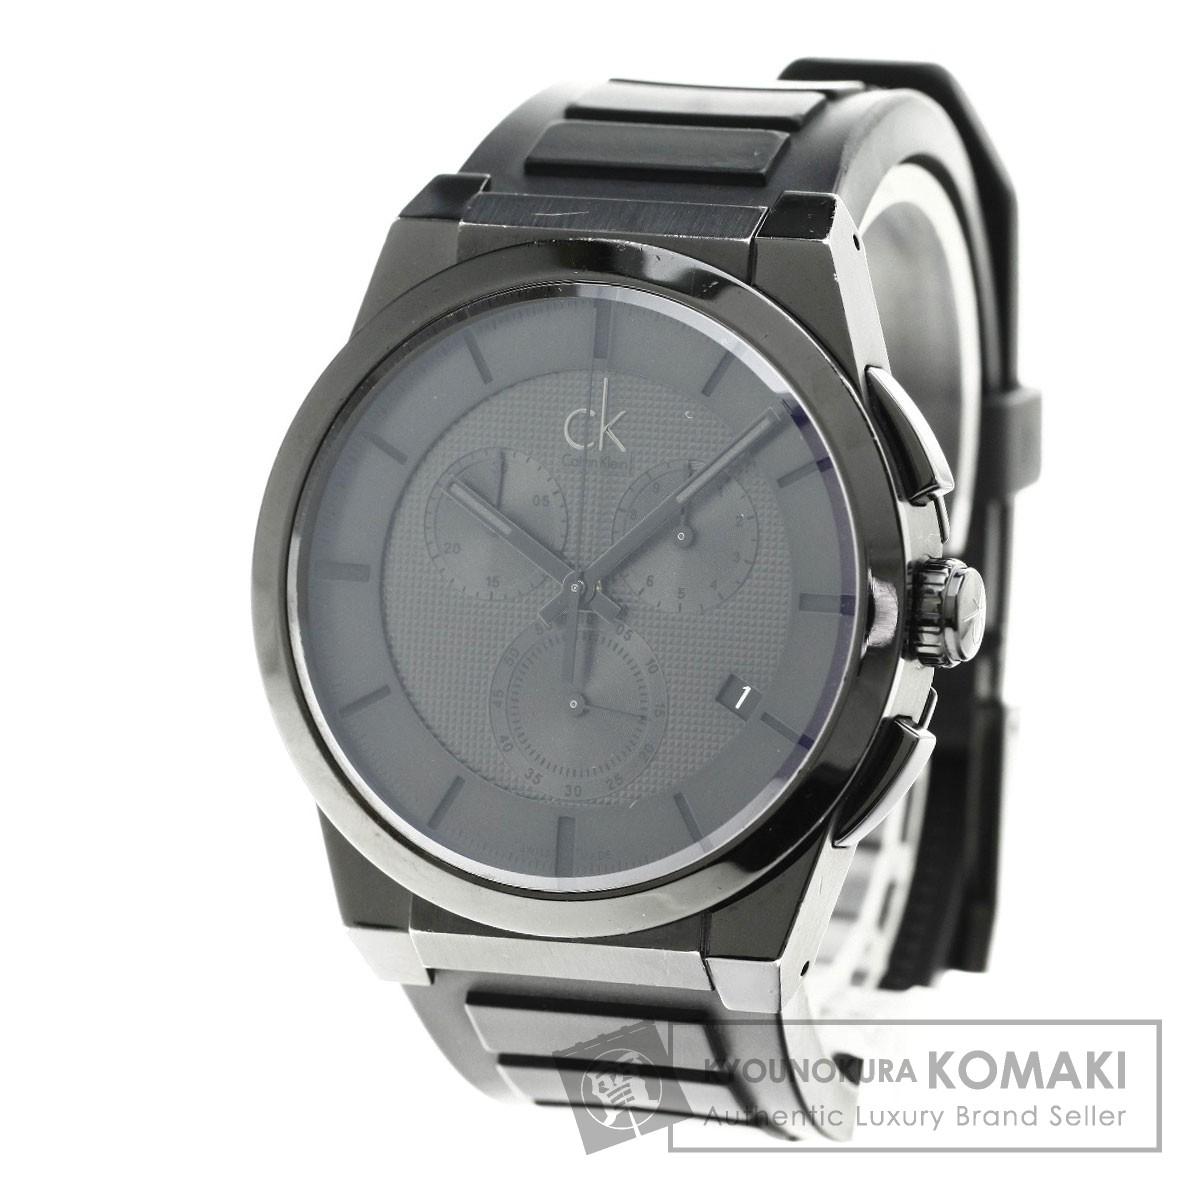 Calvin Klein K2S374 腕時計 ステンレス/ラバー メンズ 【中古】【カルバンクライン】